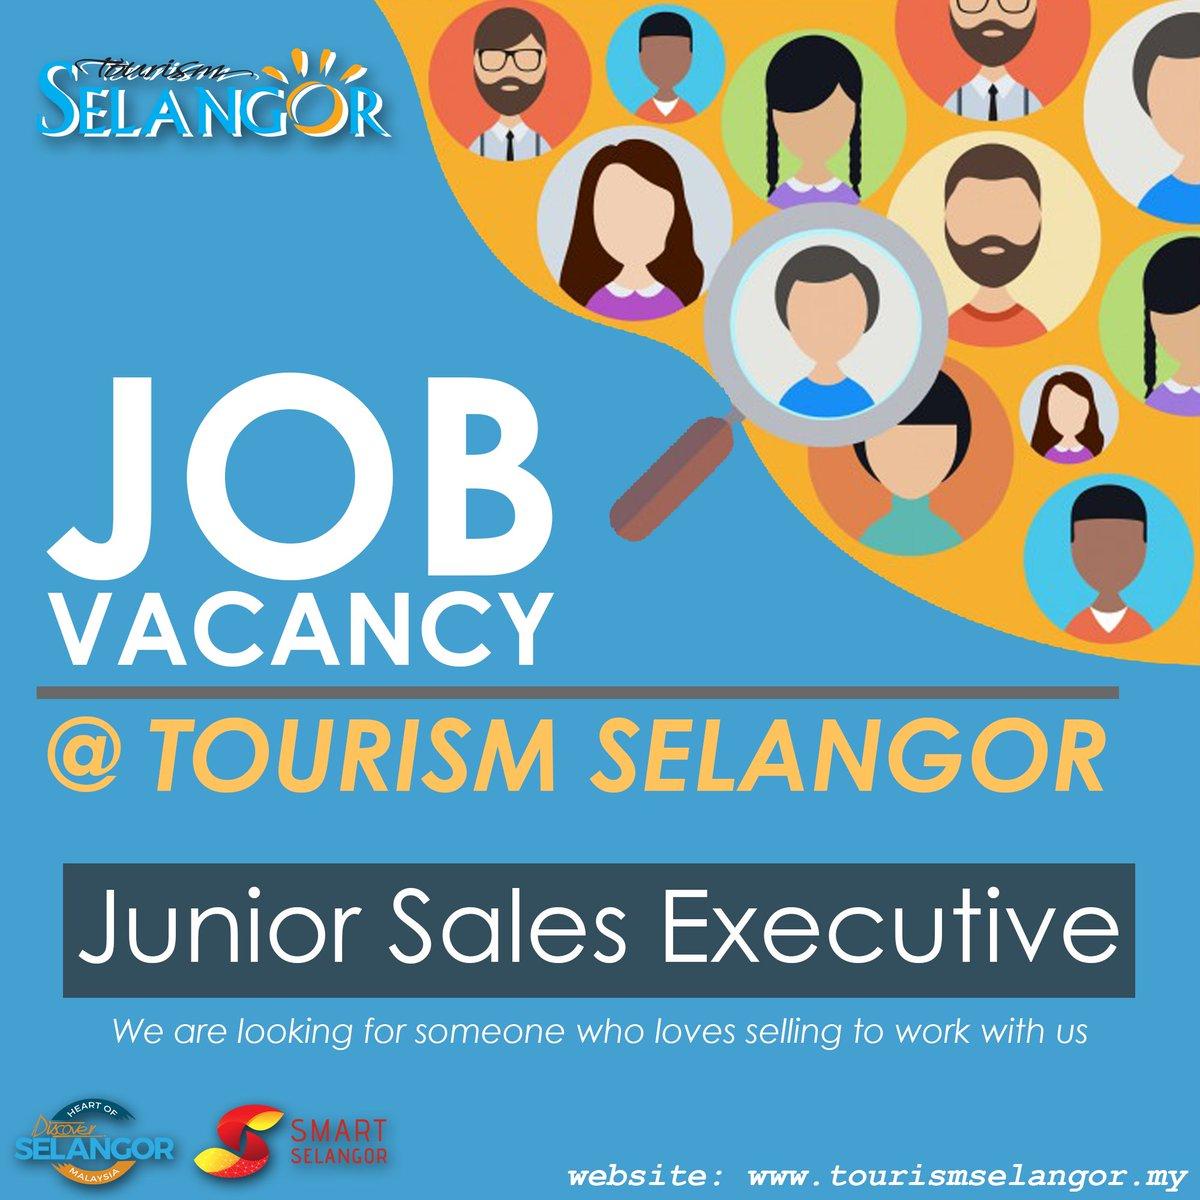 Tourism Selangor On Twitter Job Vacancy Junior Sales Executive Details Https T Co Pqoazhri6o Maukerjamy Haikerja Jomkerja Twtupcampus Skootjobs Jawatannkosong Jawatannkosong Twt Rezeki Twtshah Alam Oh Kerjakosong Twt Kerja Https T